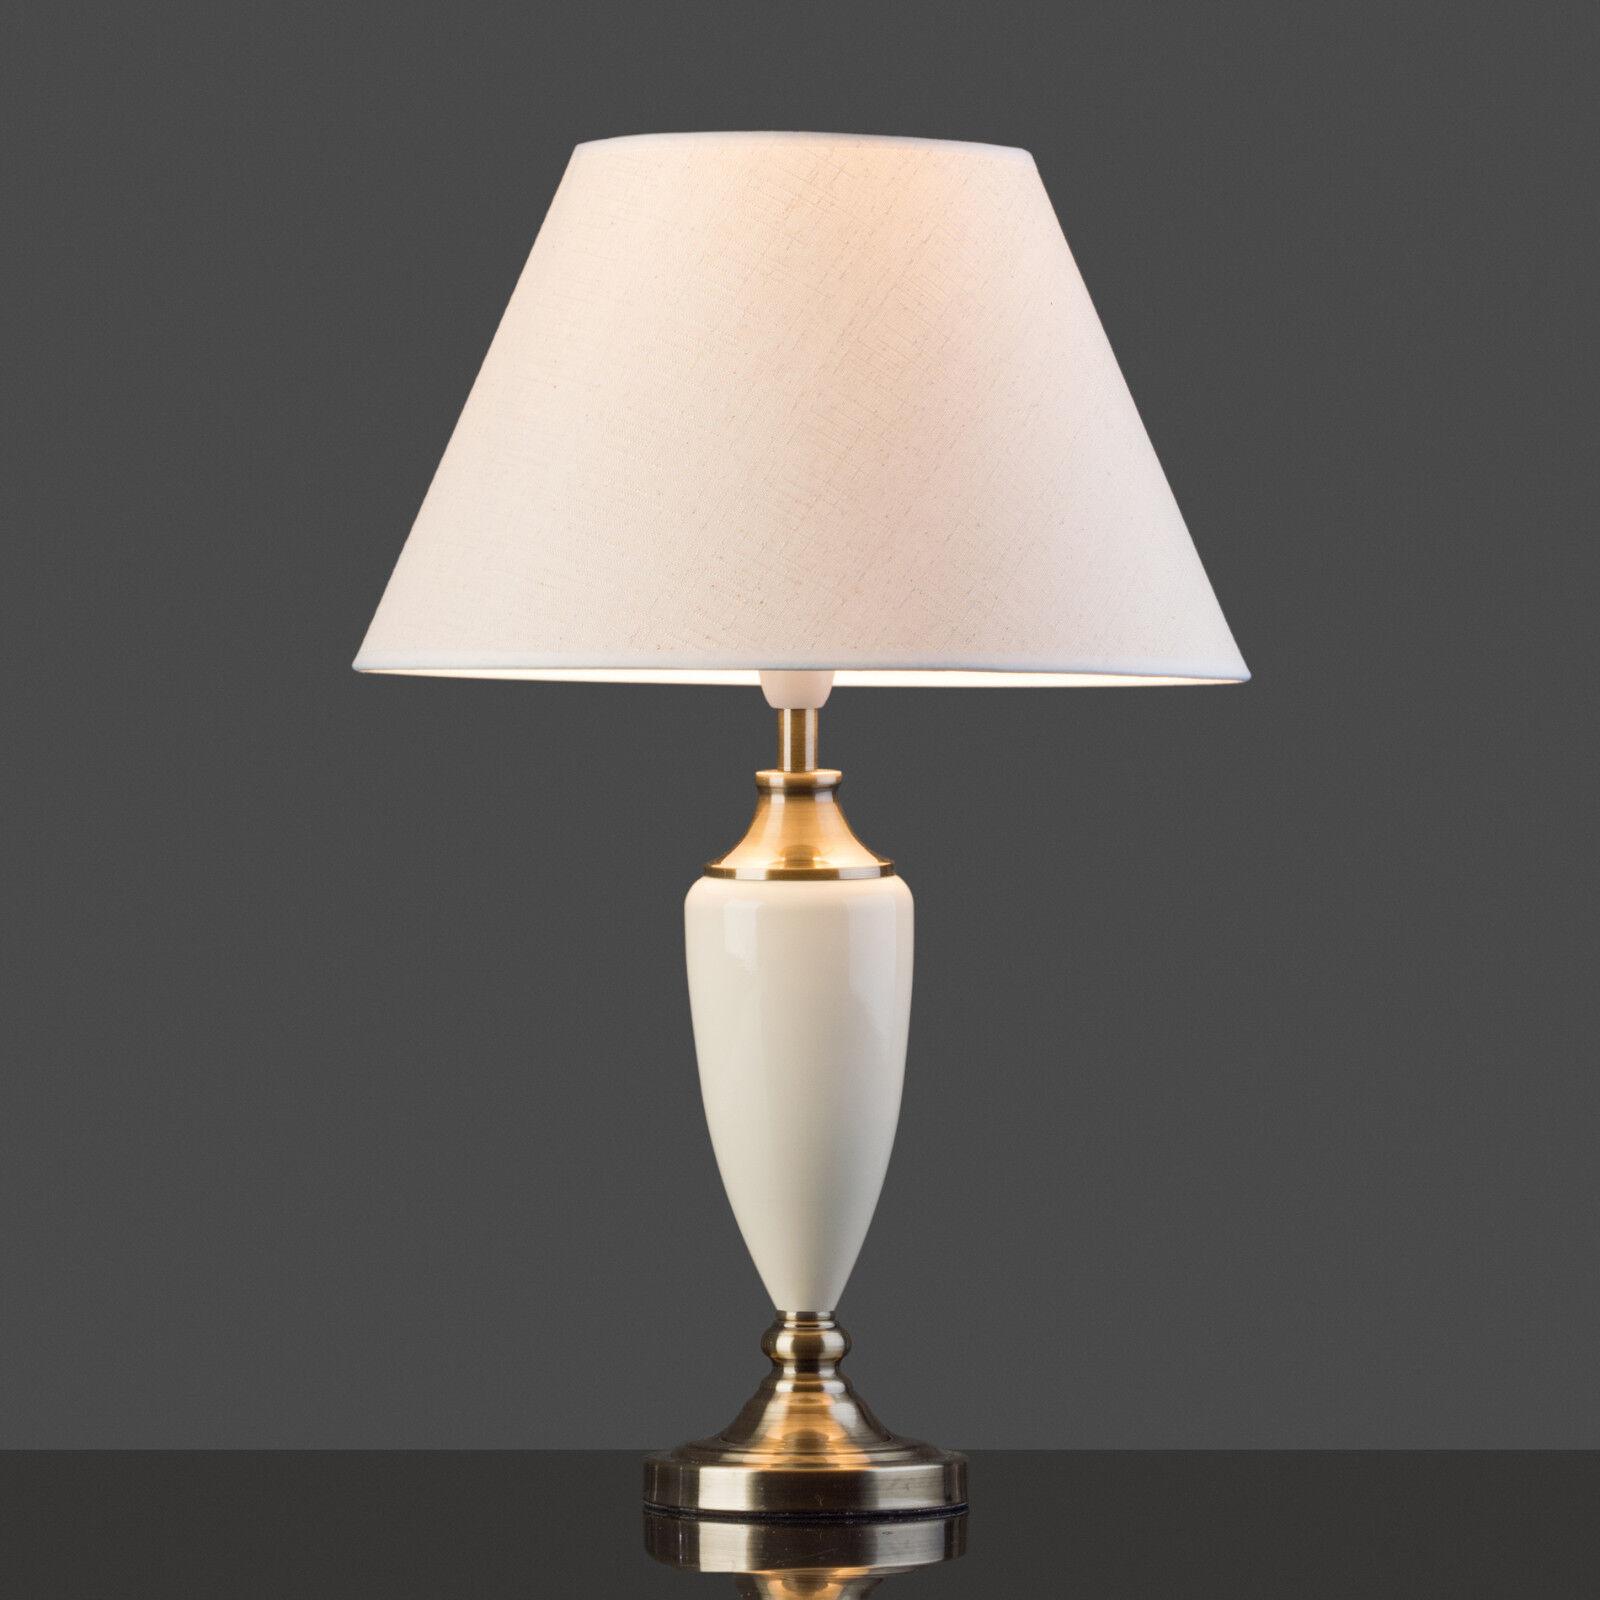 Large Malham Cream Ceramic And Antique Brass Traditional Table Lamp Shade 5060377981598 Ebay